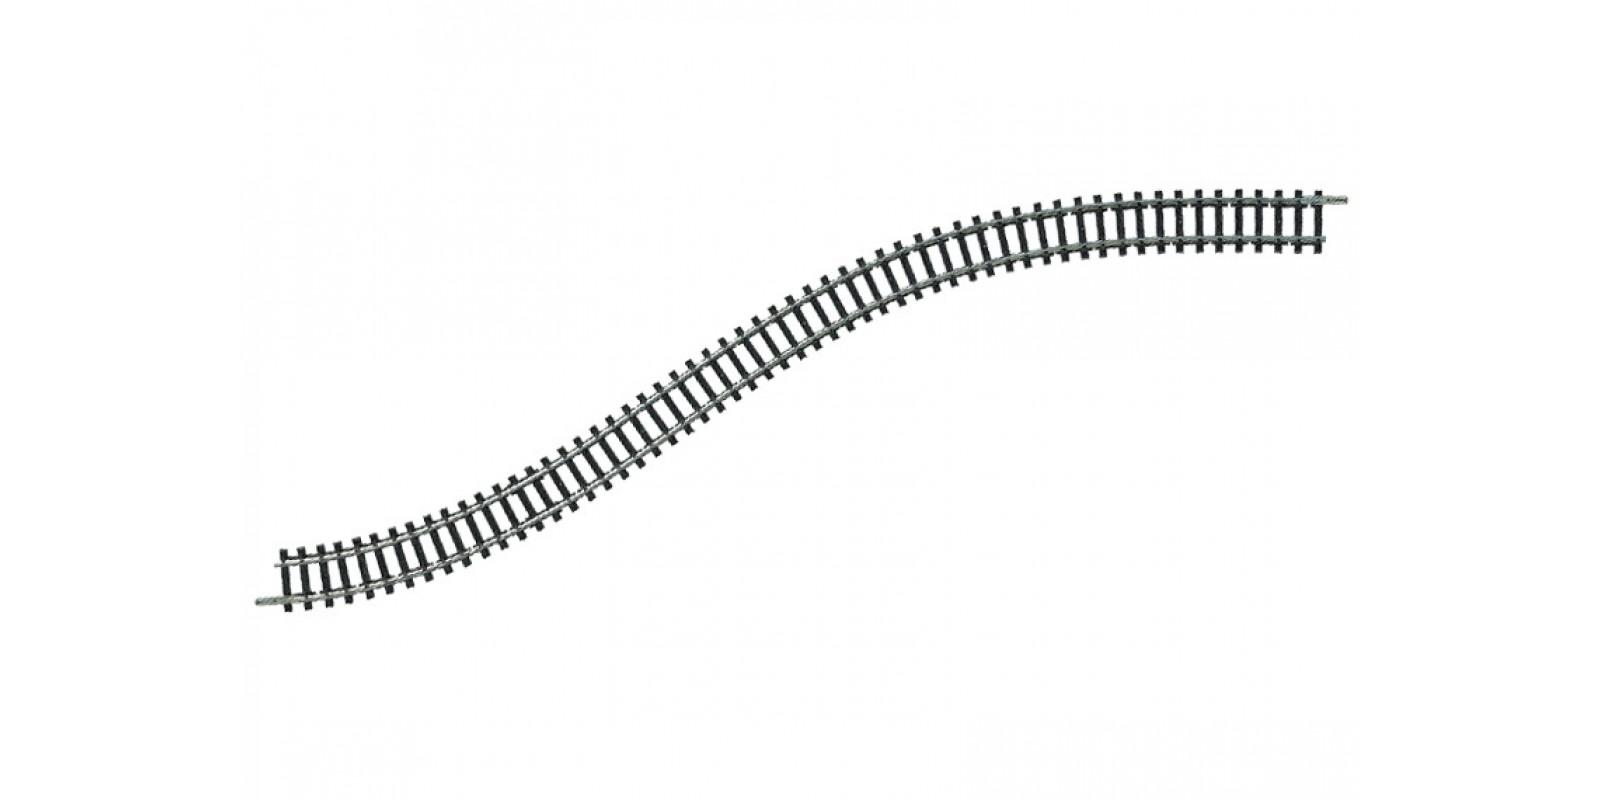 T14901 - Flex Track